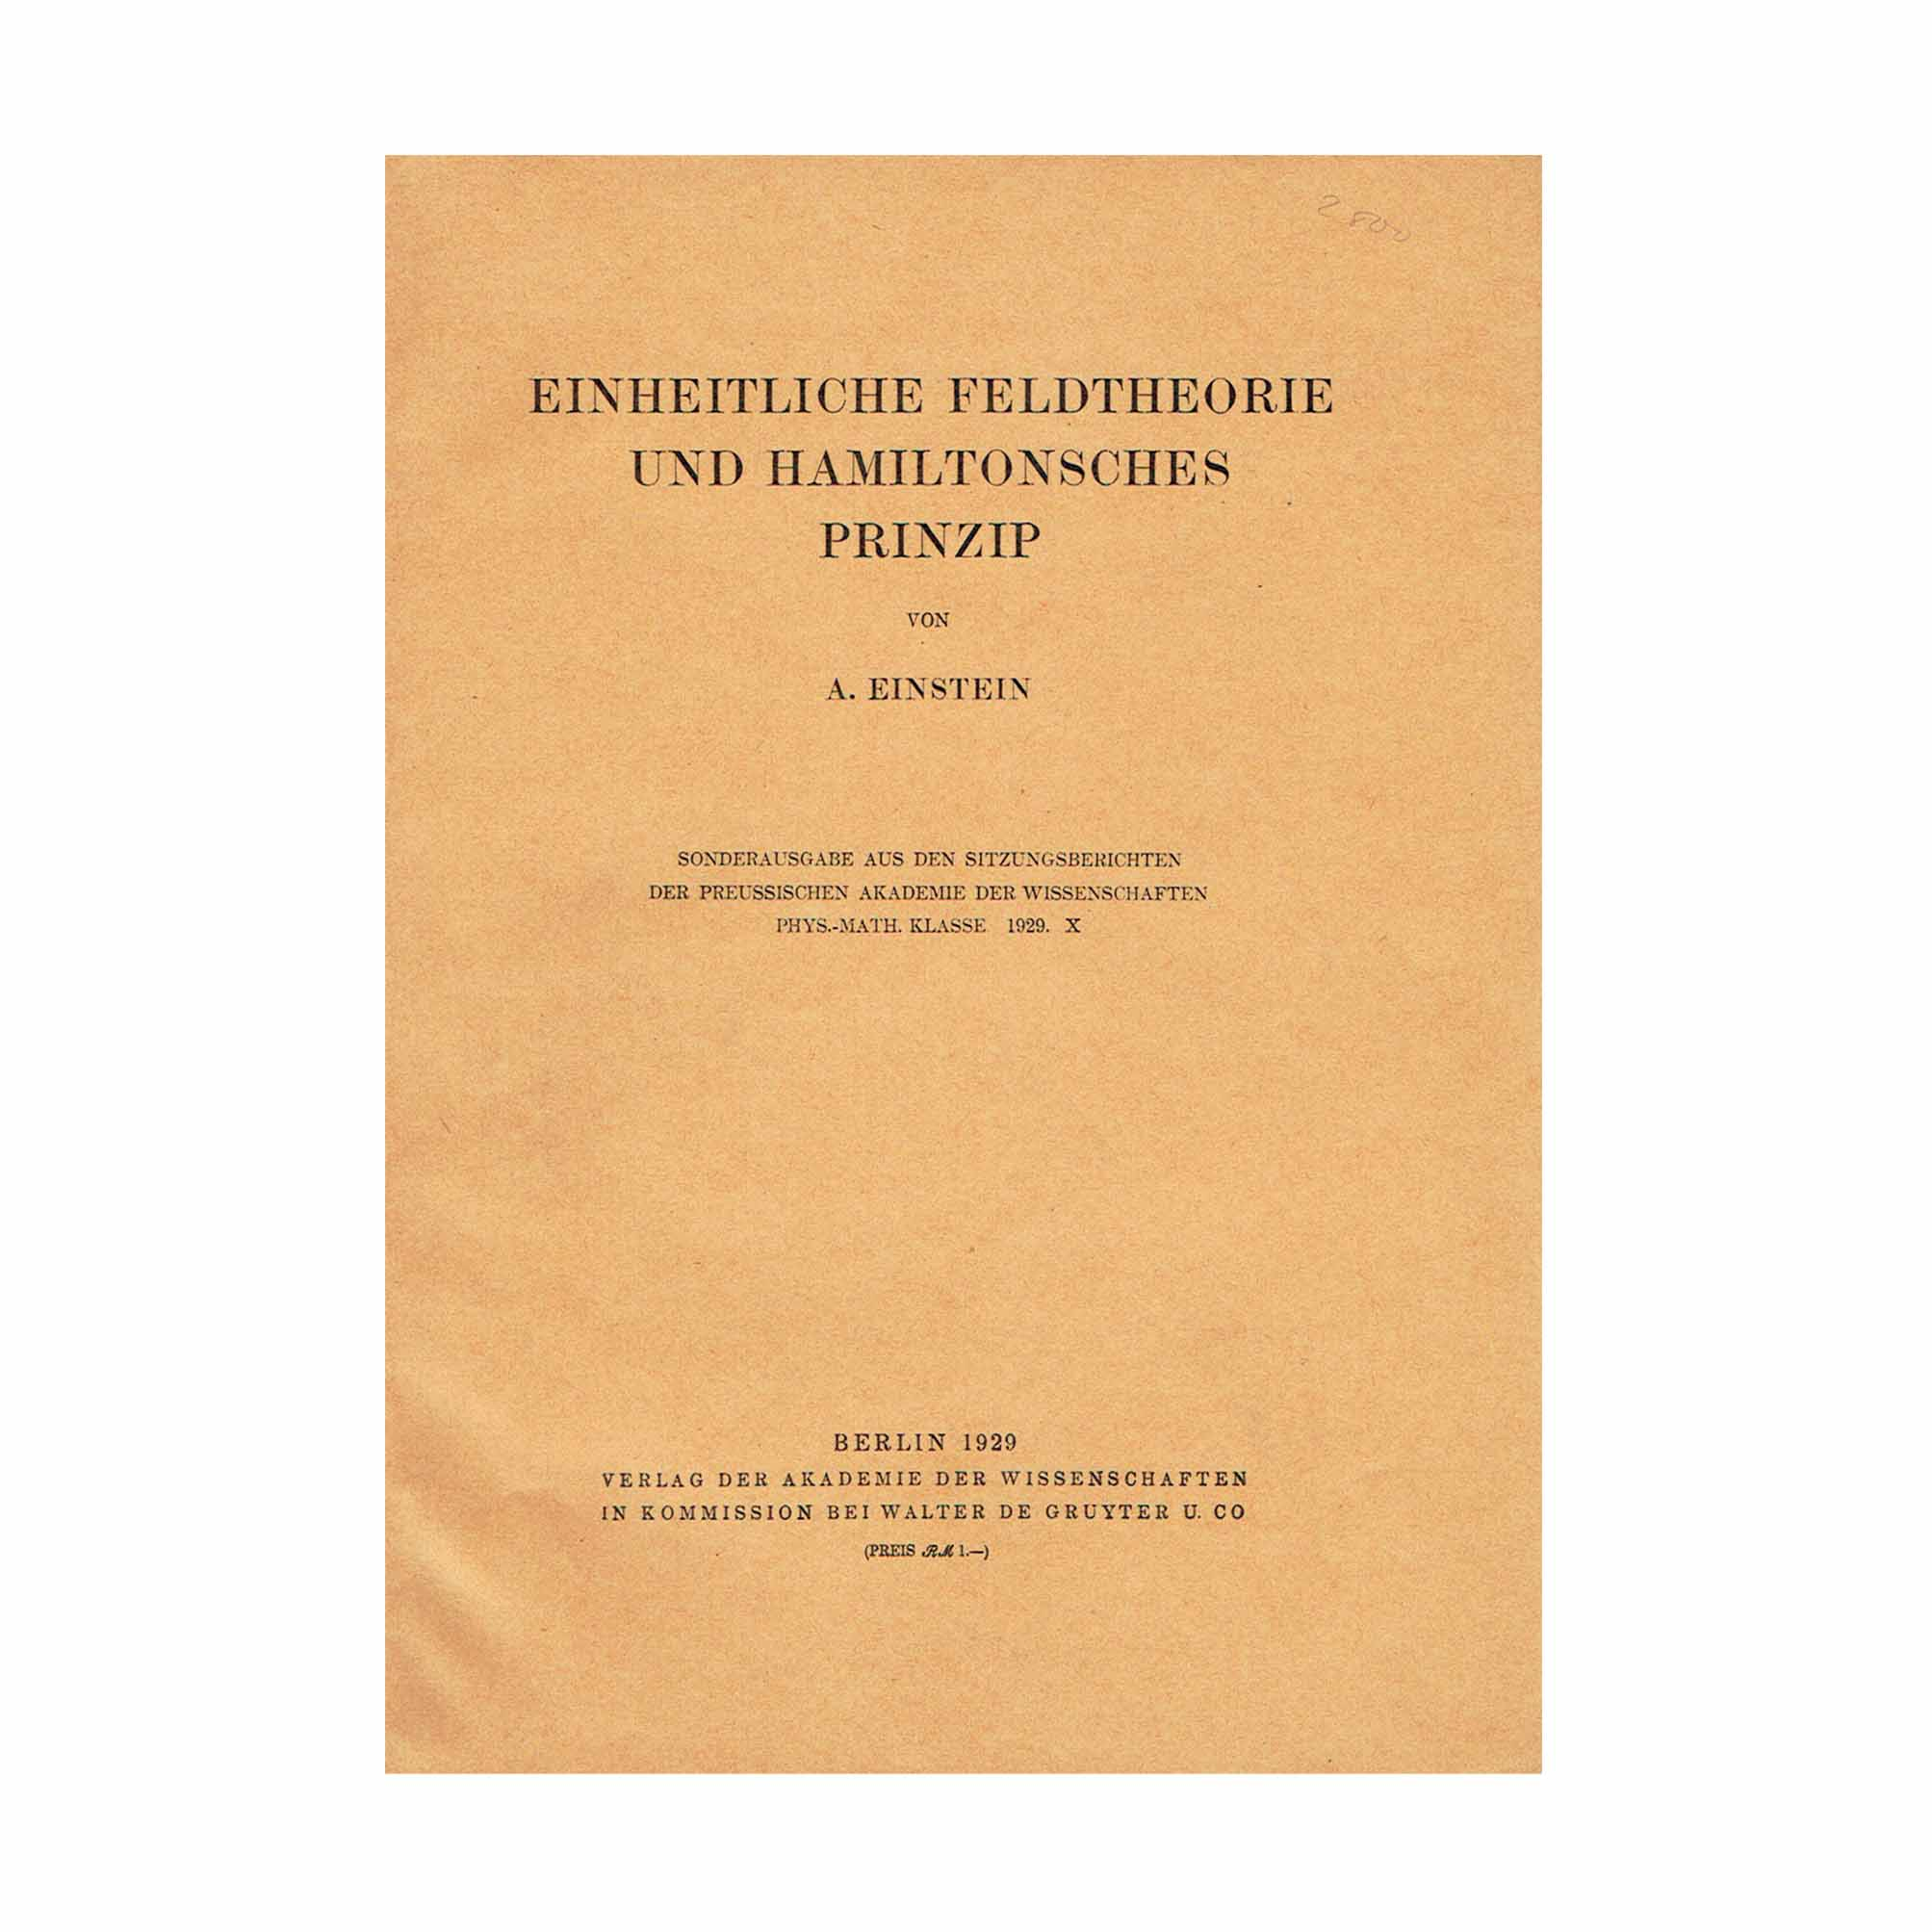 5740-Field-Theory-Hamilton-Akademie-X-1929-SA-Cover-recto-N.jpg